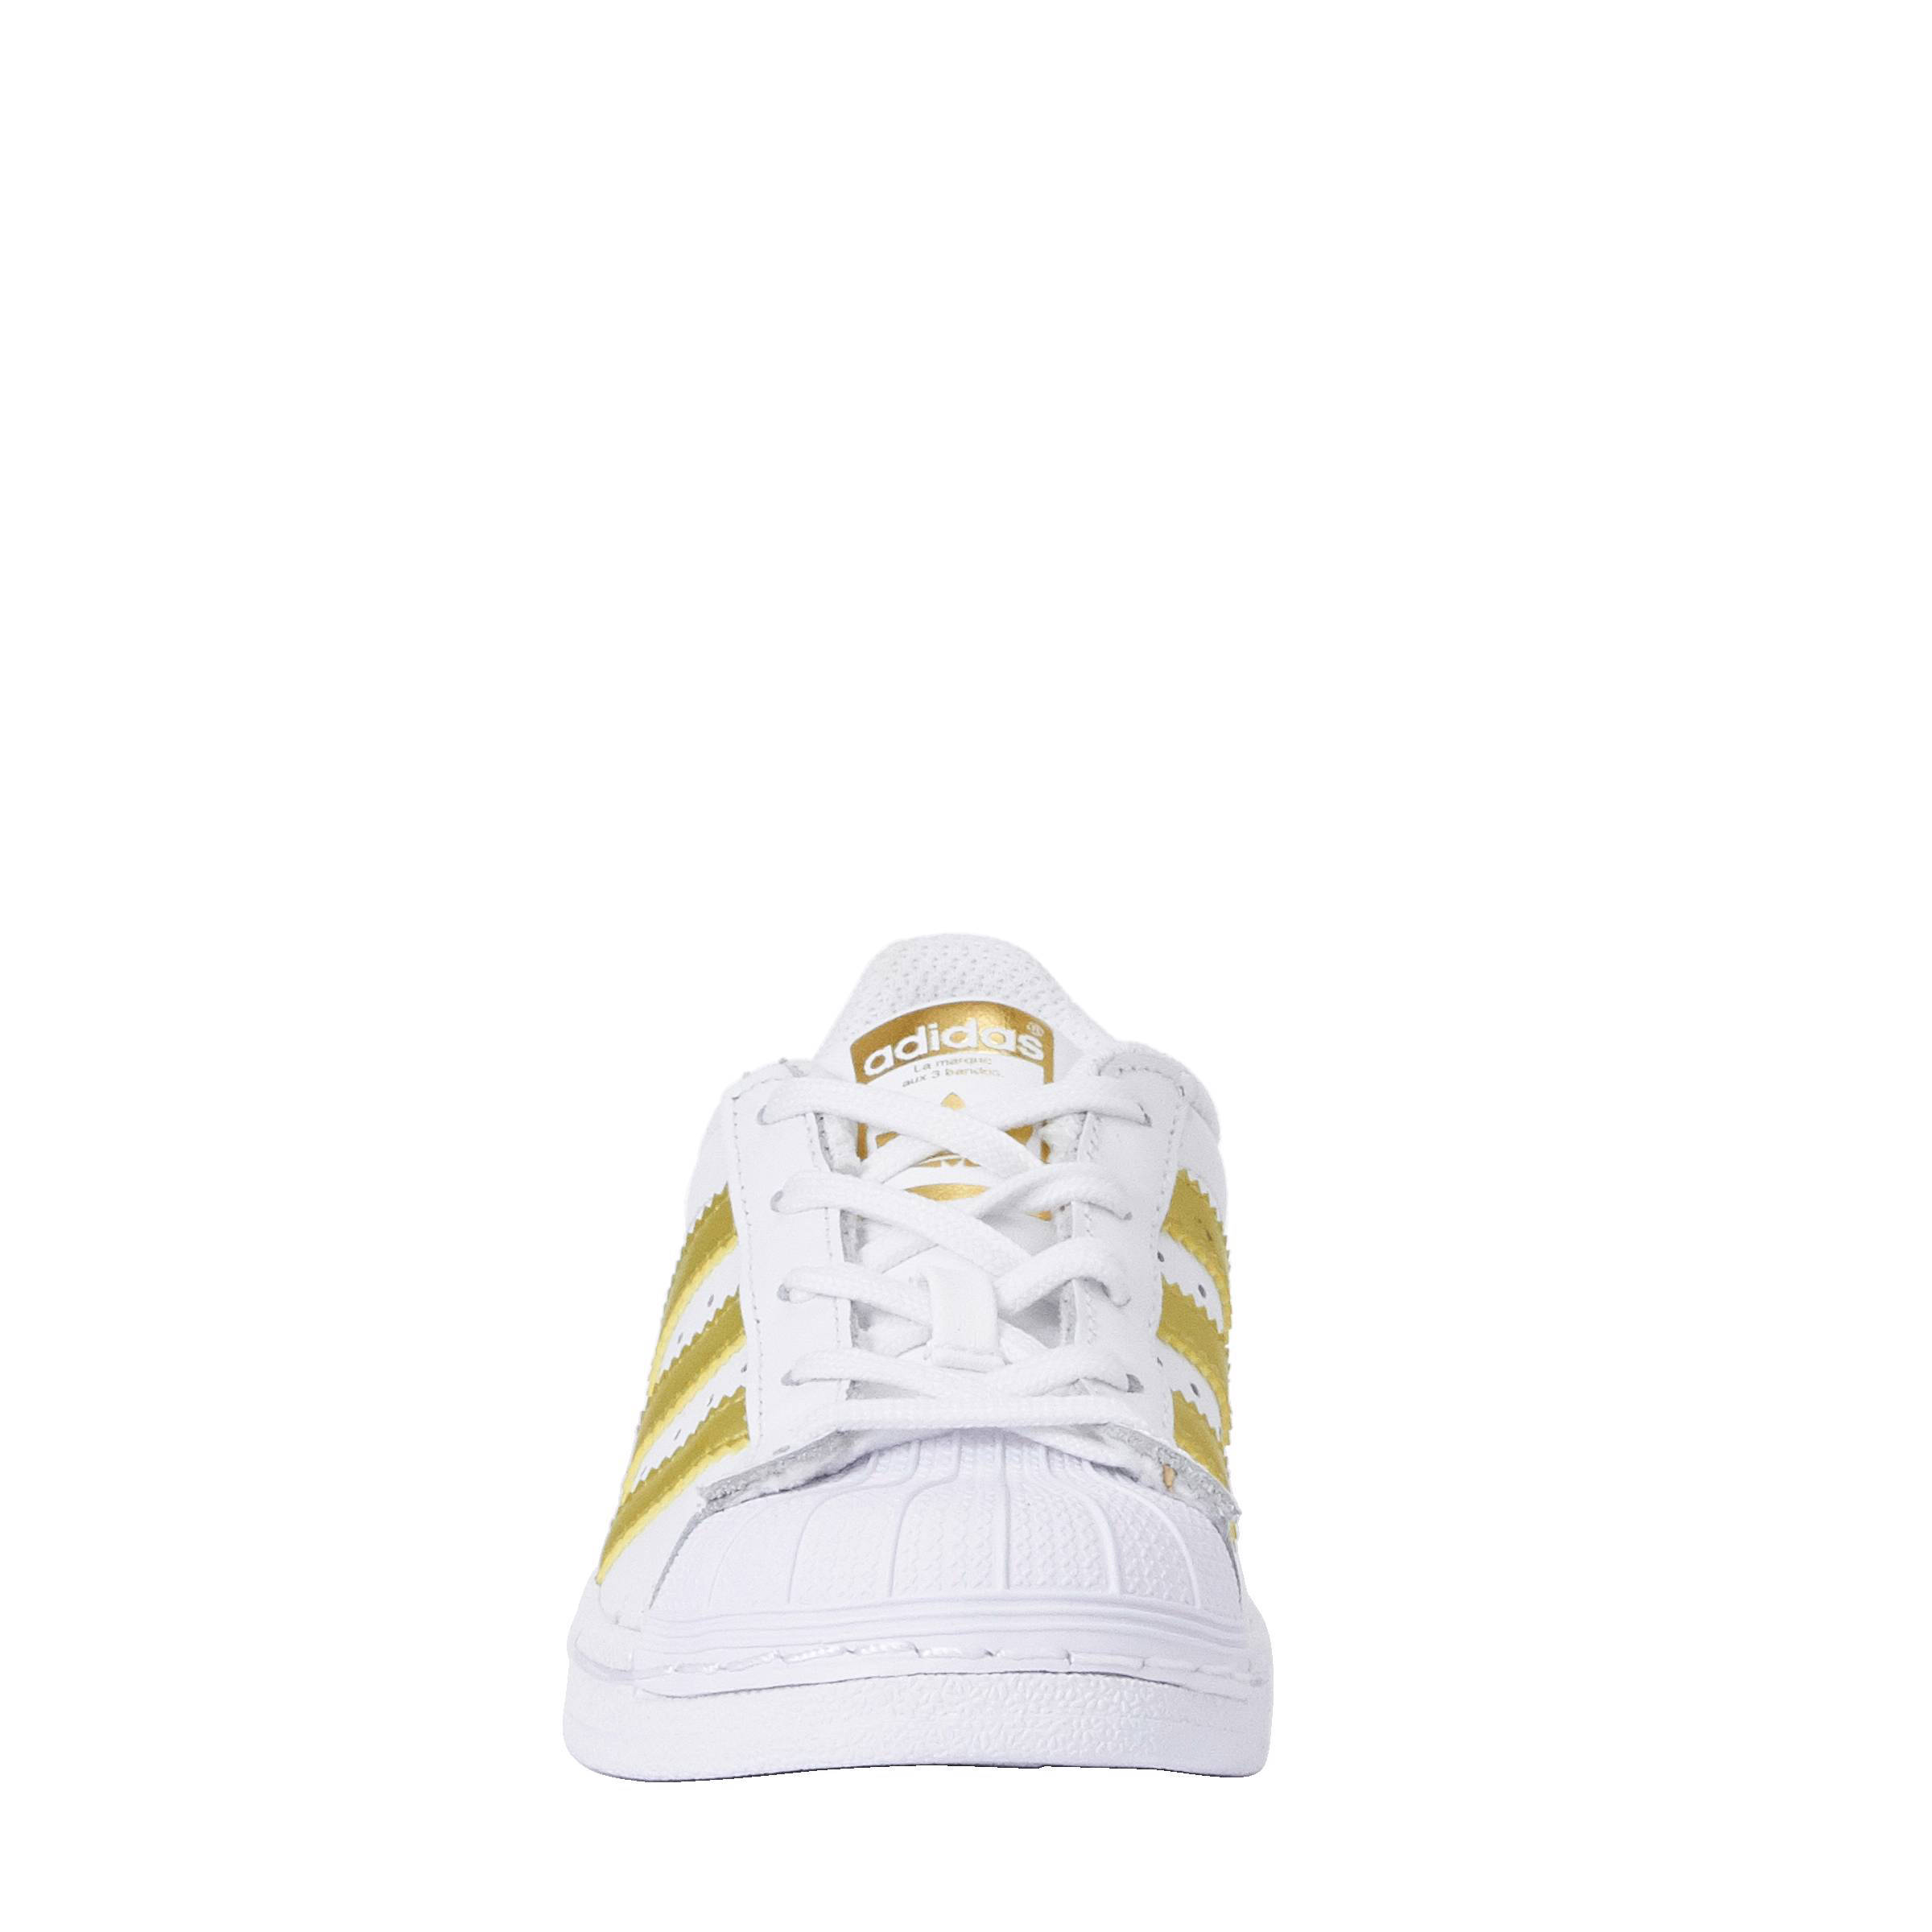 8f20b826cb2 adidas originals Superstar Foundation C sneakers   wehkamp